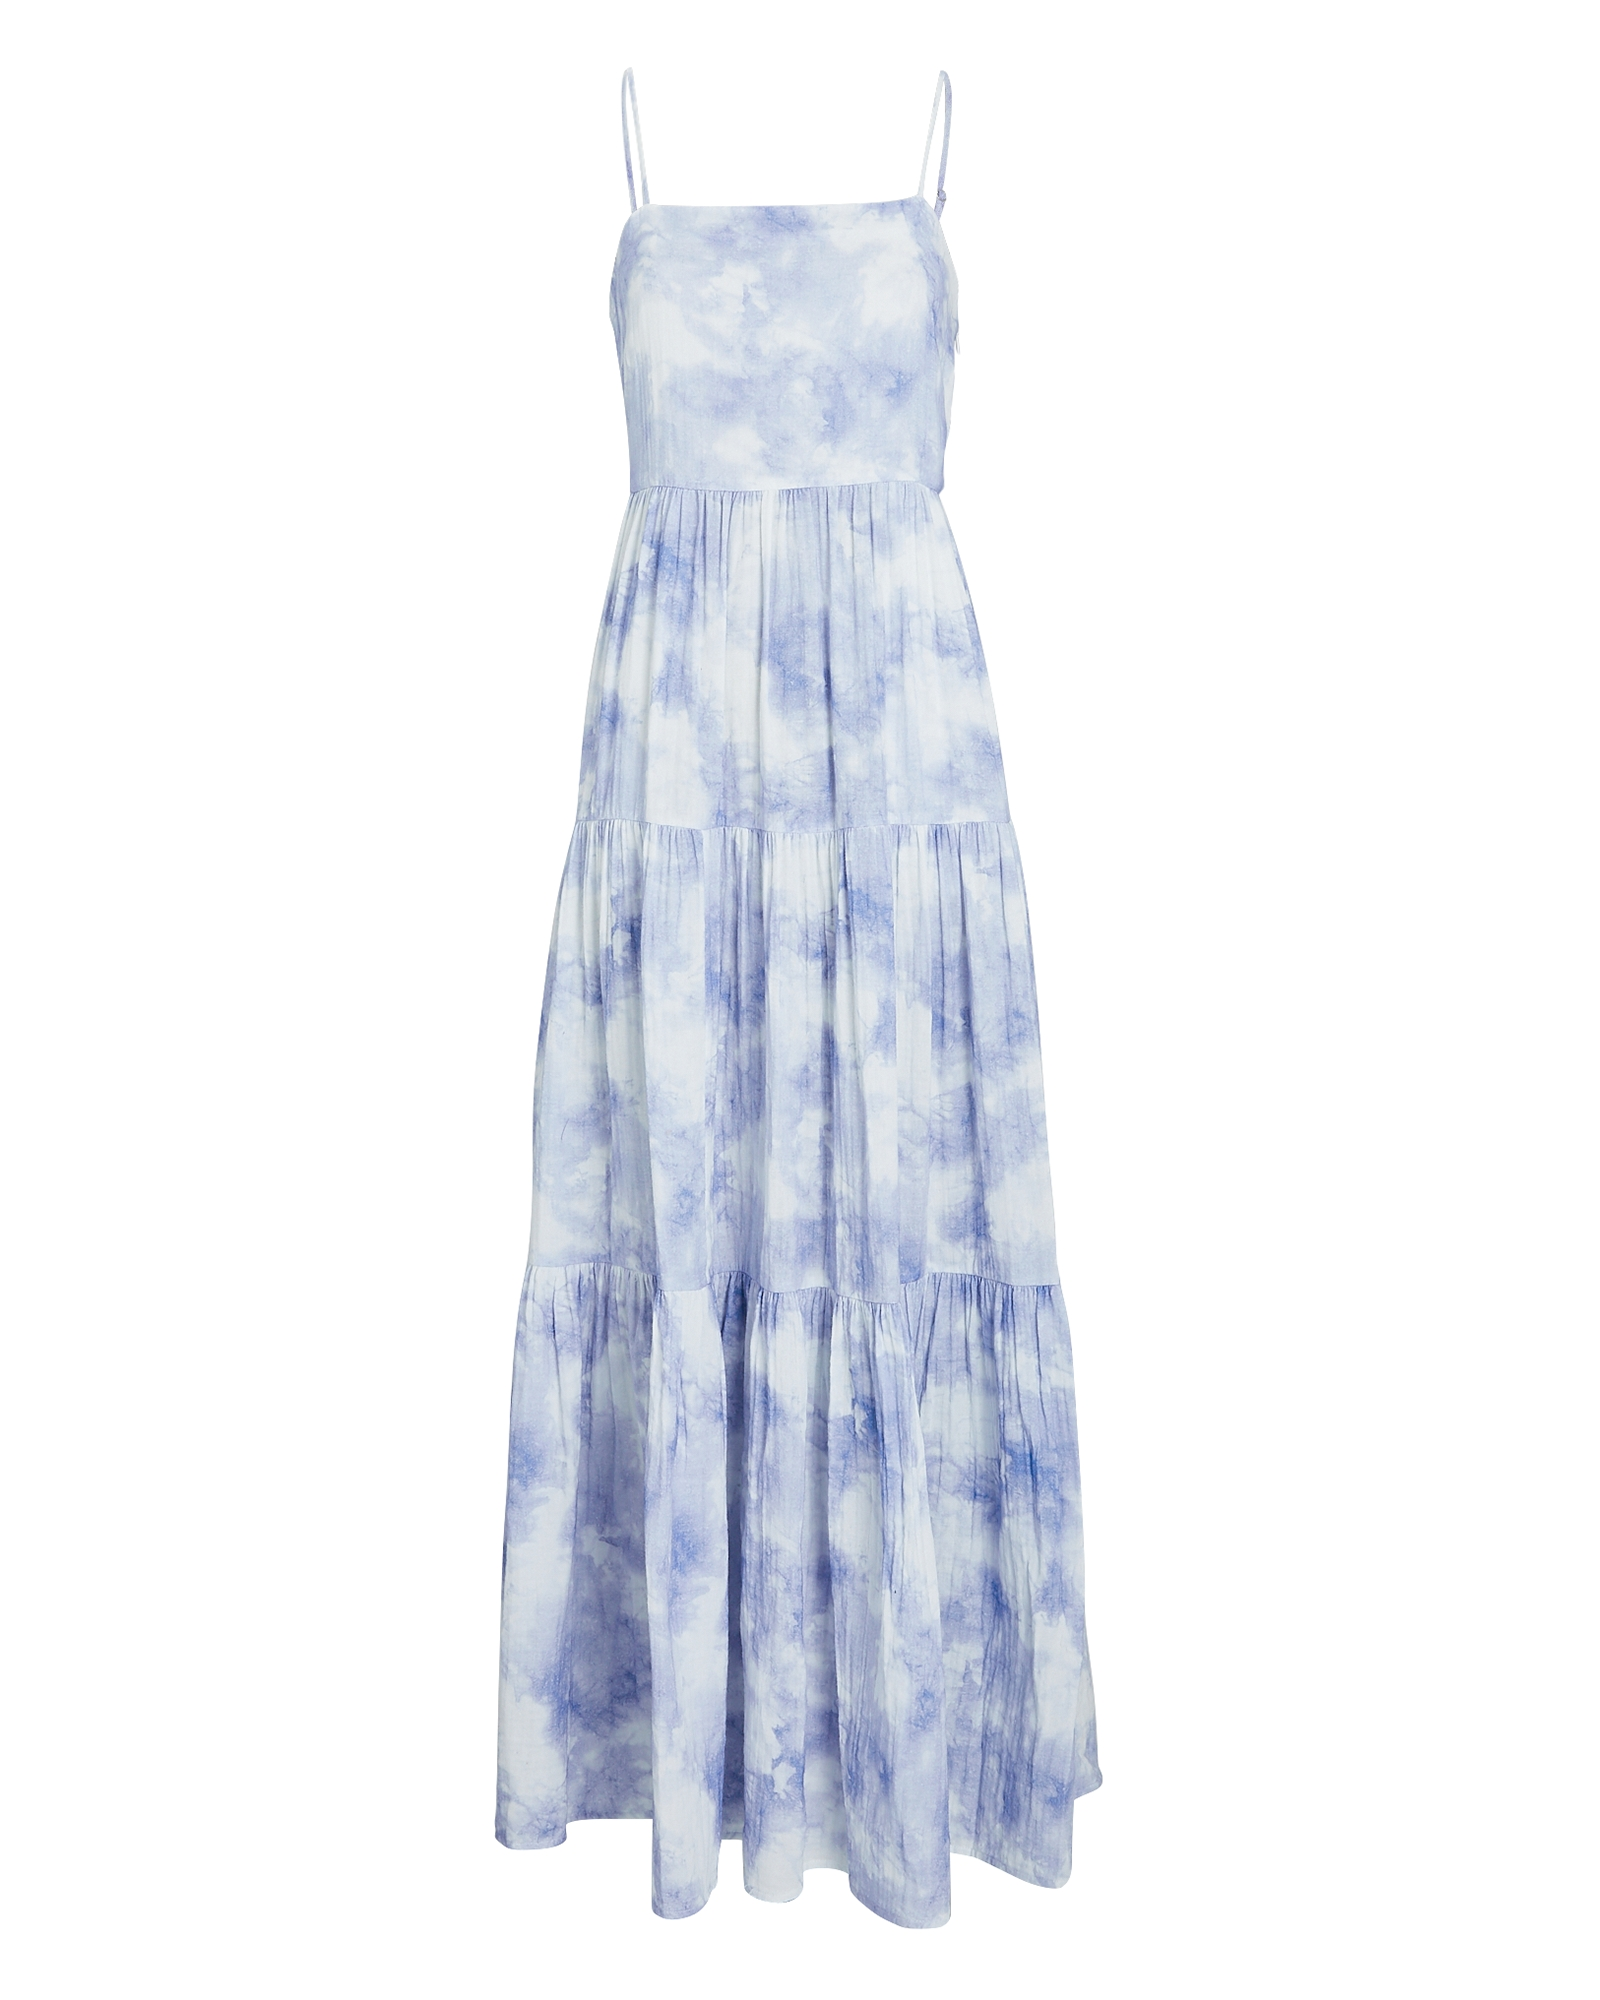 Jonathan Simkhai Cottons Clarissa Tie-Dye Gauze Maxi Dress